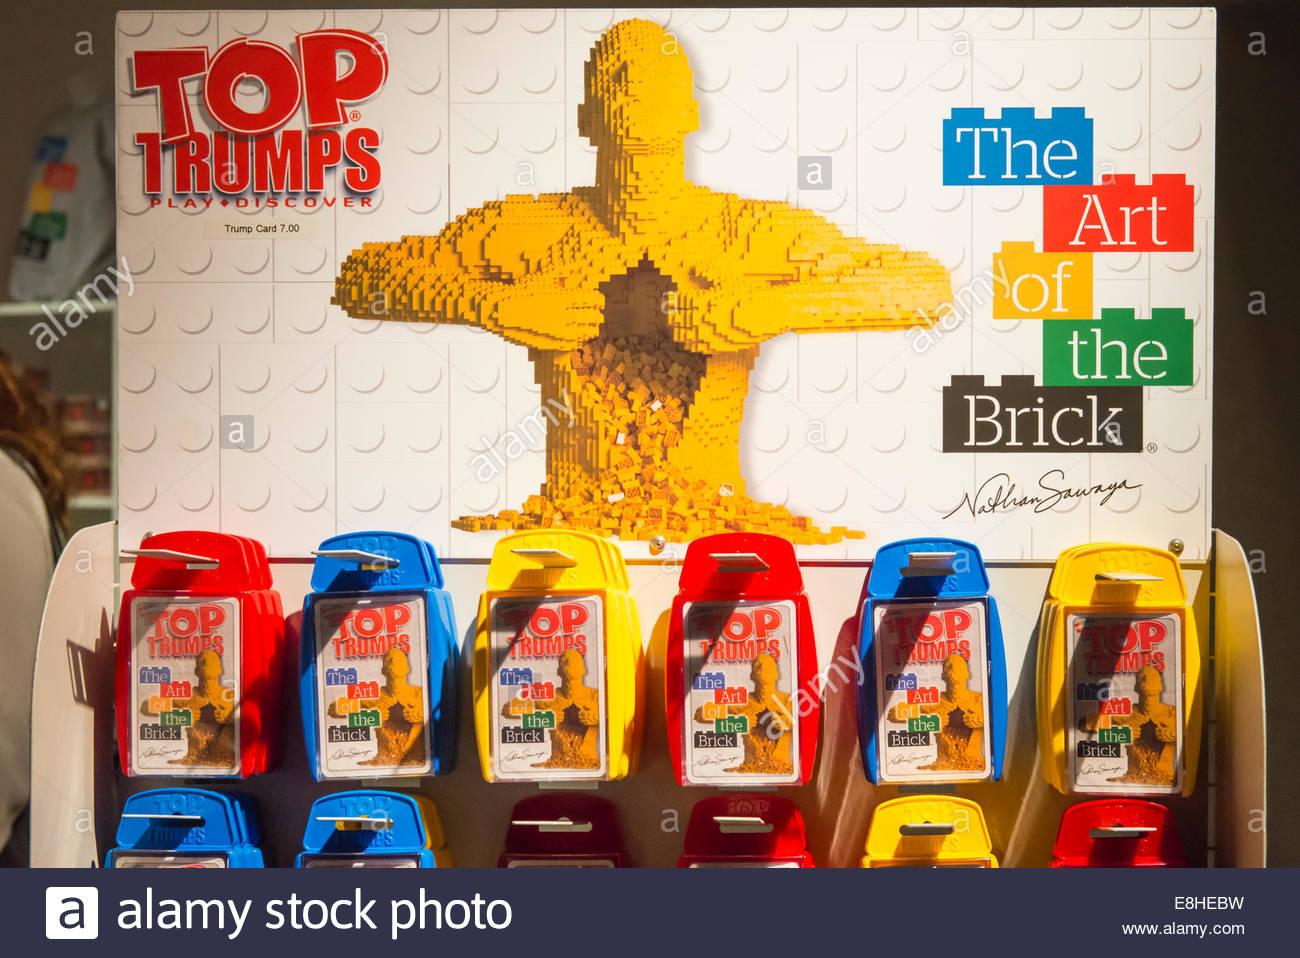 Exhibition Stand Game : Art of brick exhibition show nathan sawaya lego figures